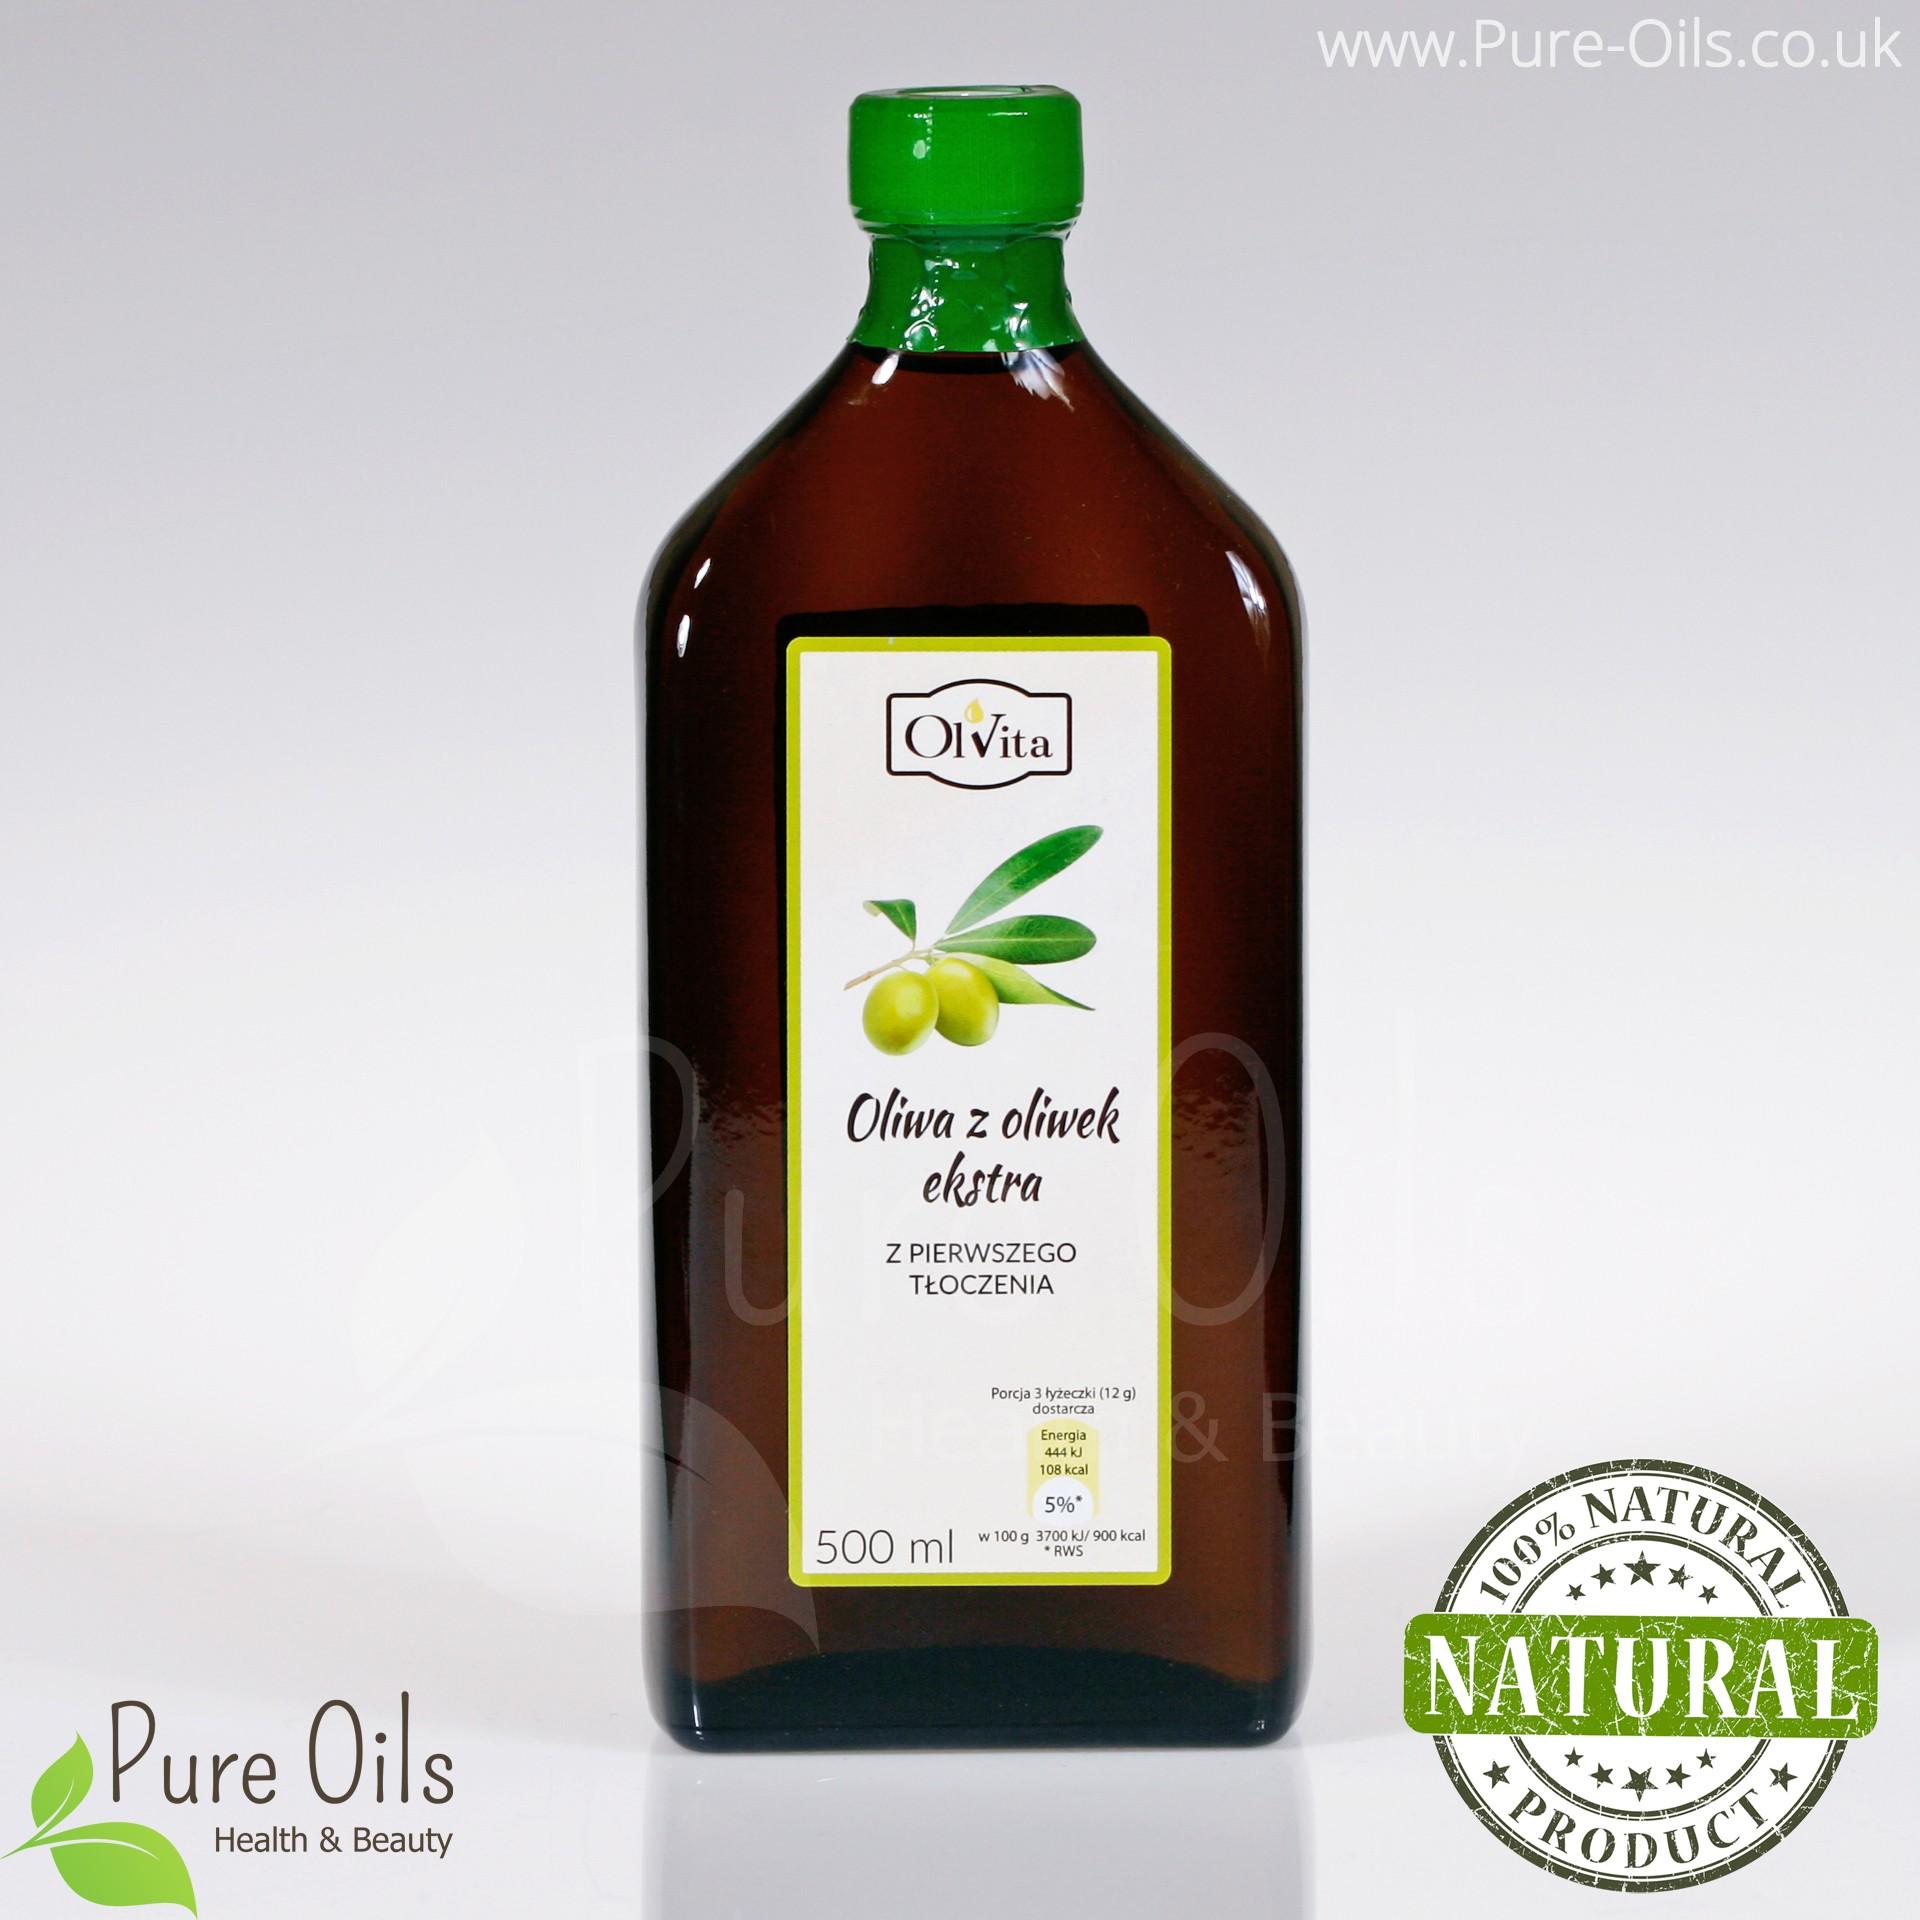 Olive Oil  Cold Pressed, Extra Virgin, Ol'vita 500 Ml